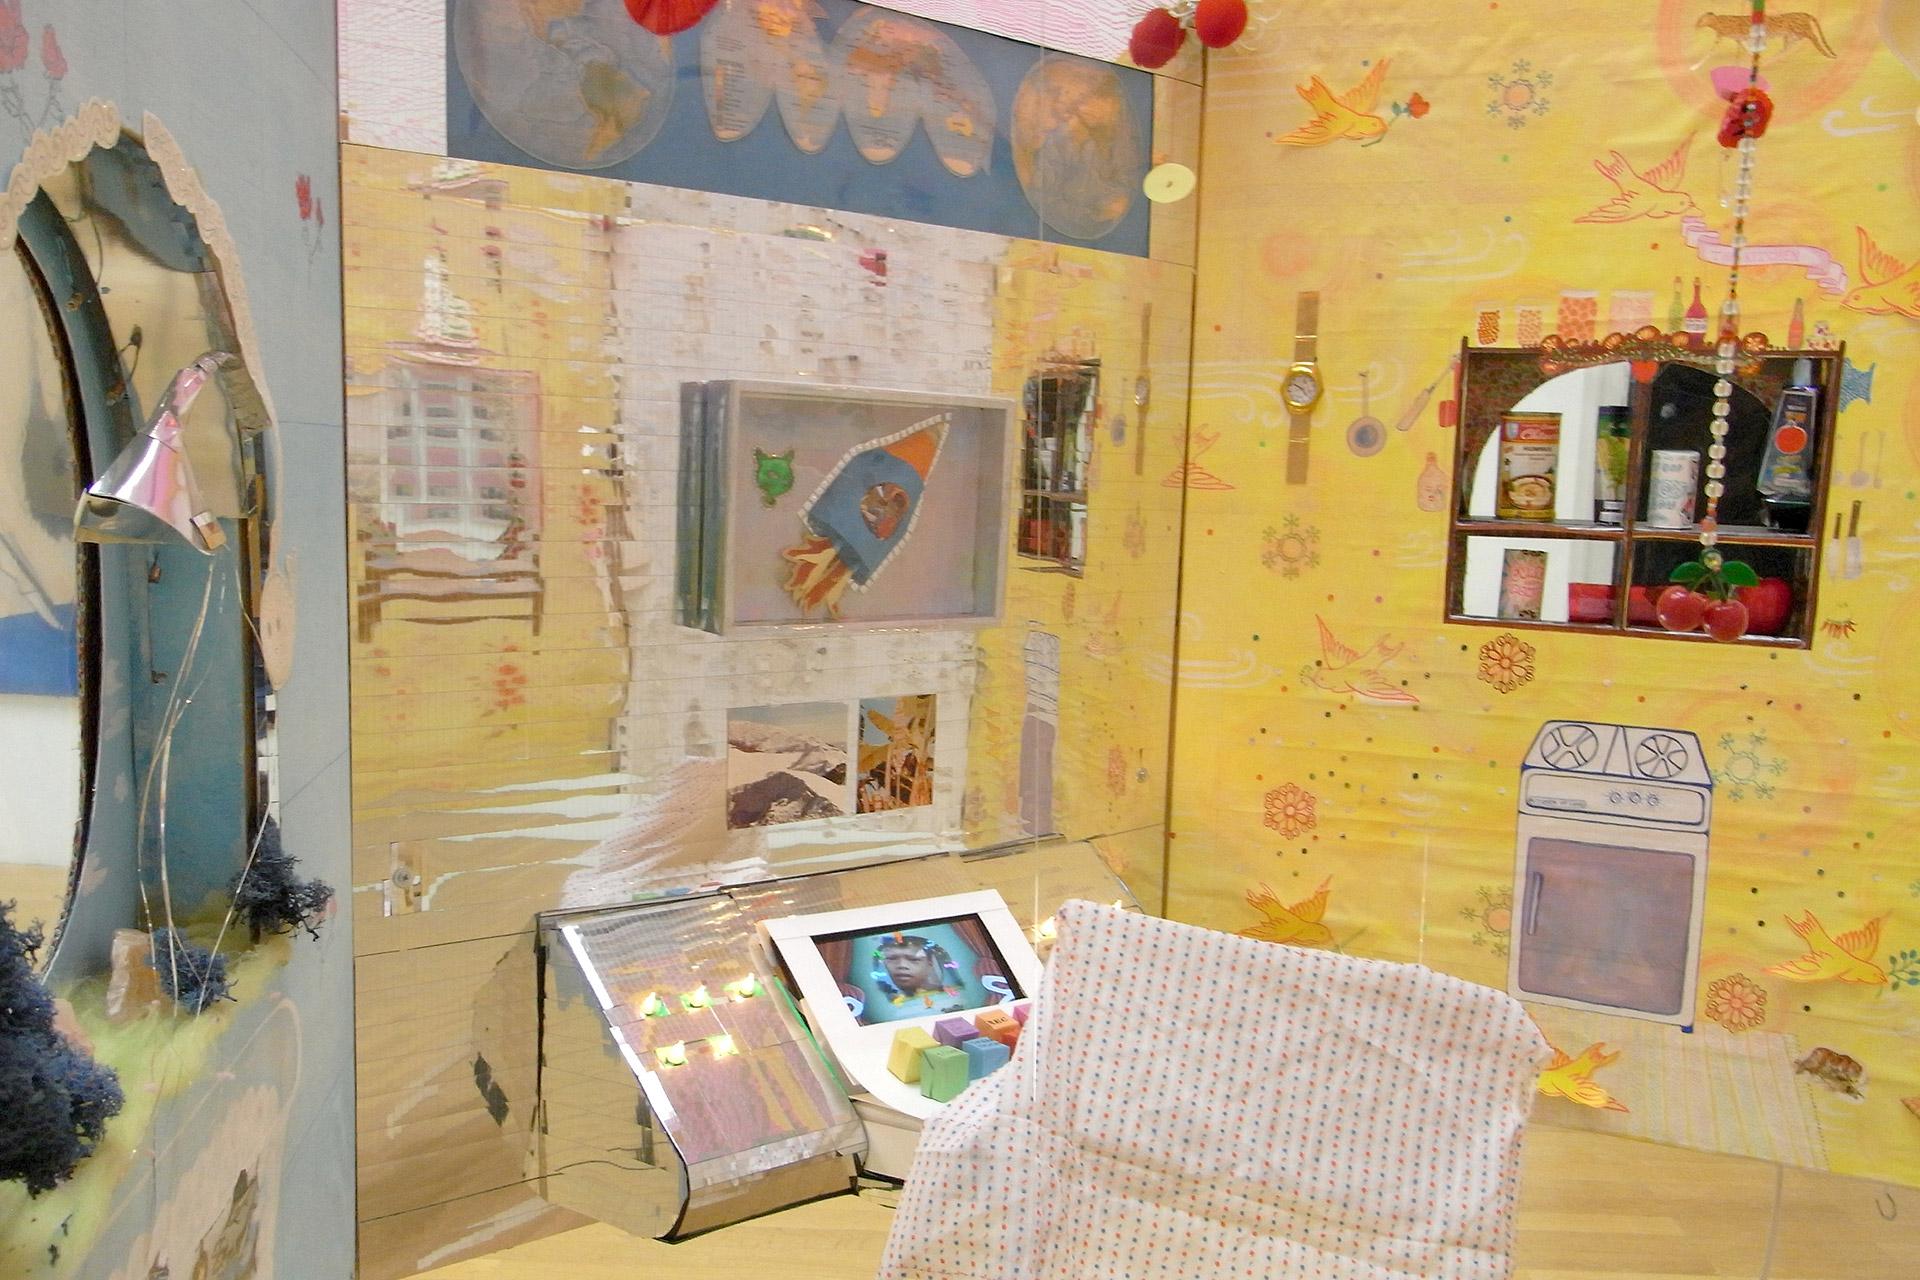 Dezember-Ausstellung-Kunsthalle-Winterthur-2009-4.jpg